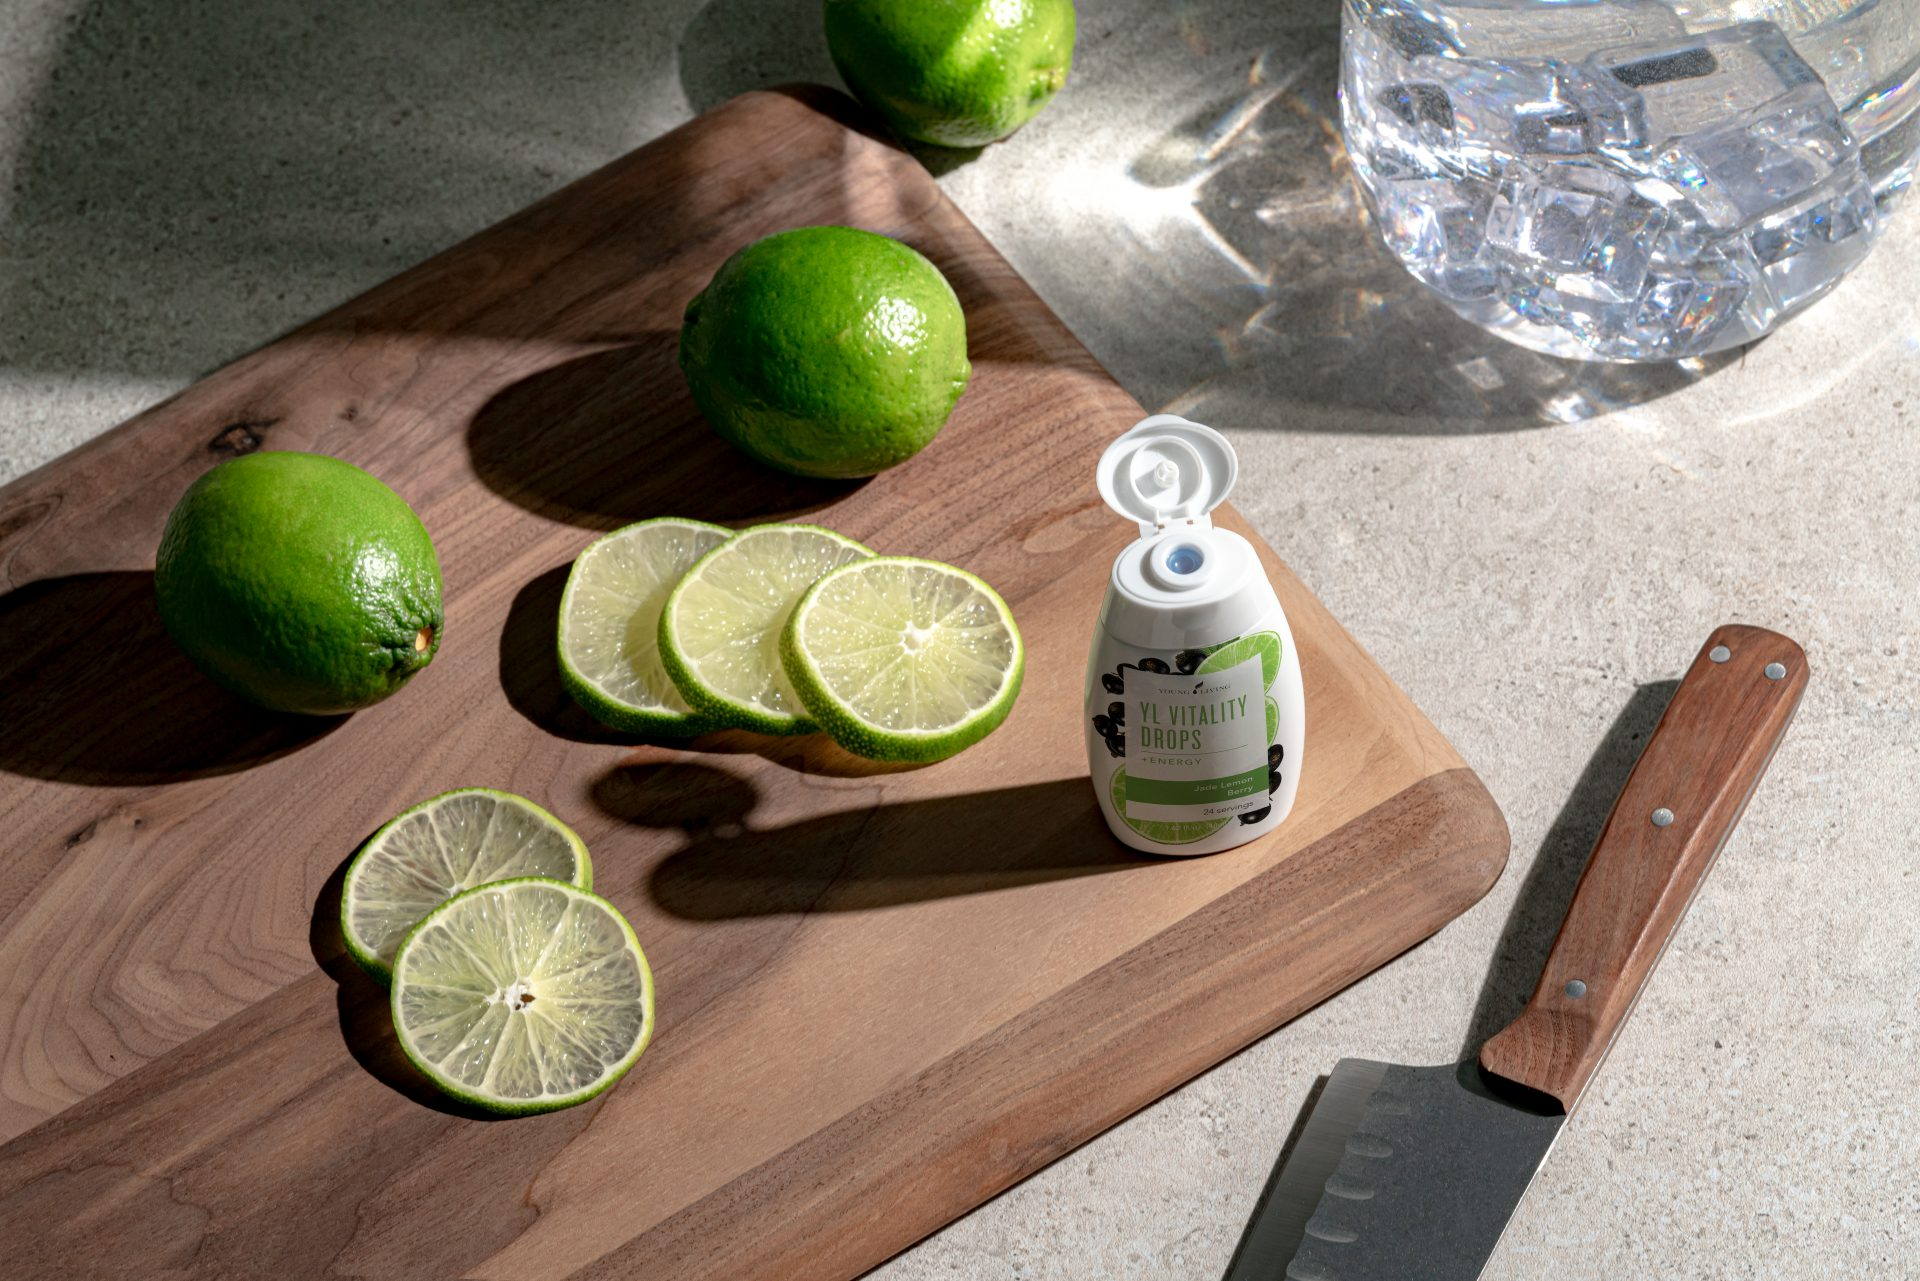 Jade Lemon Berry Vitality Drops +Energy - Young Living Essential Oils